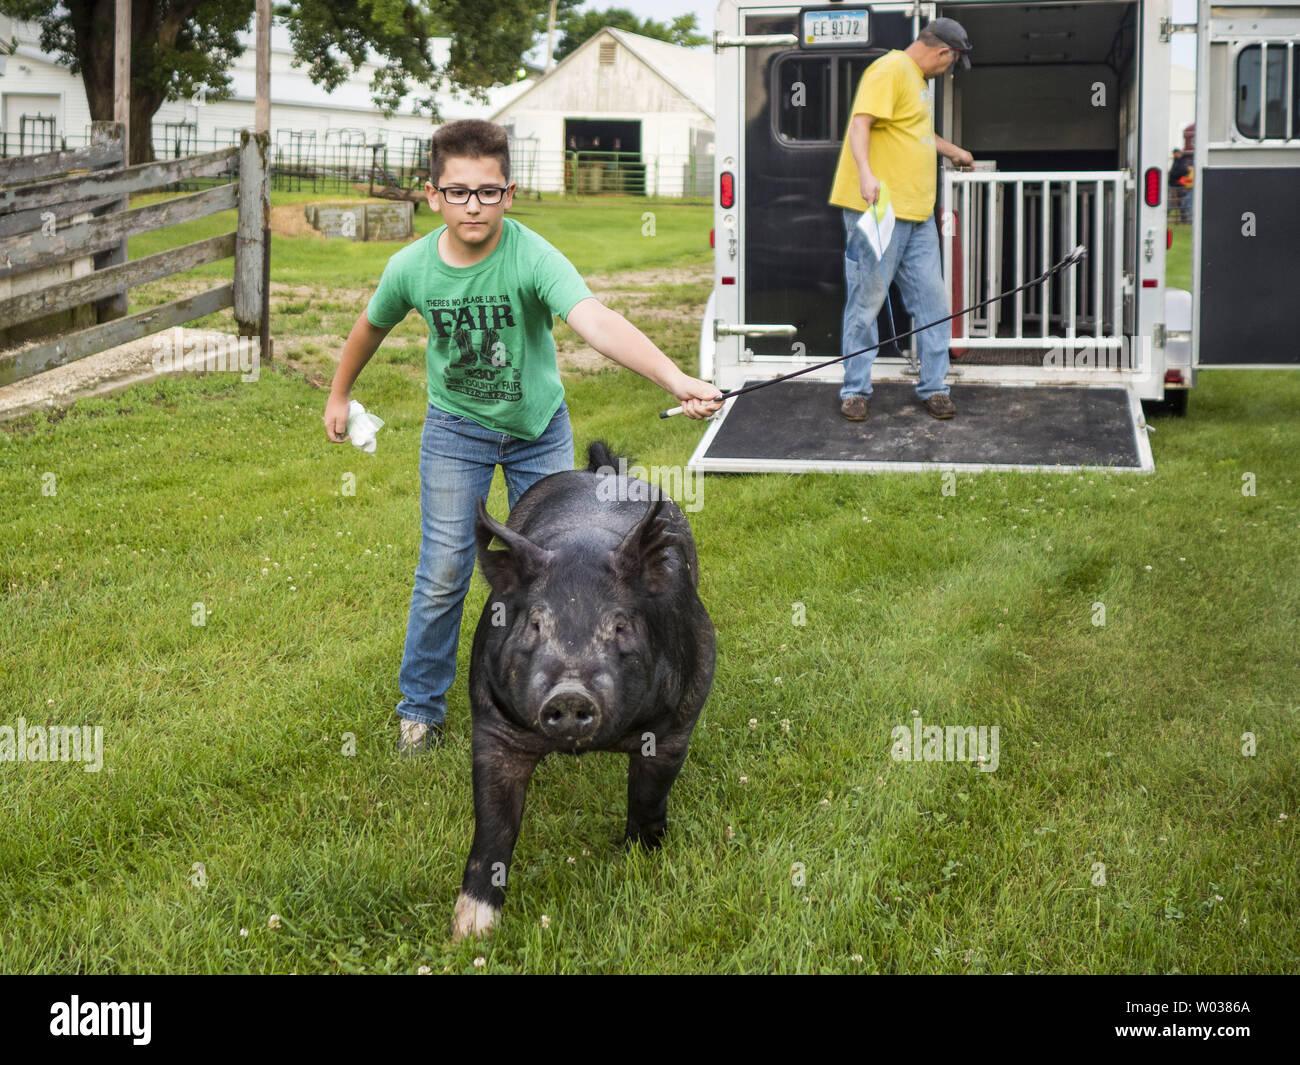 Whiteside County Fair 2020.Iowa County Fair Stock Photos Iowa County Fair Stock